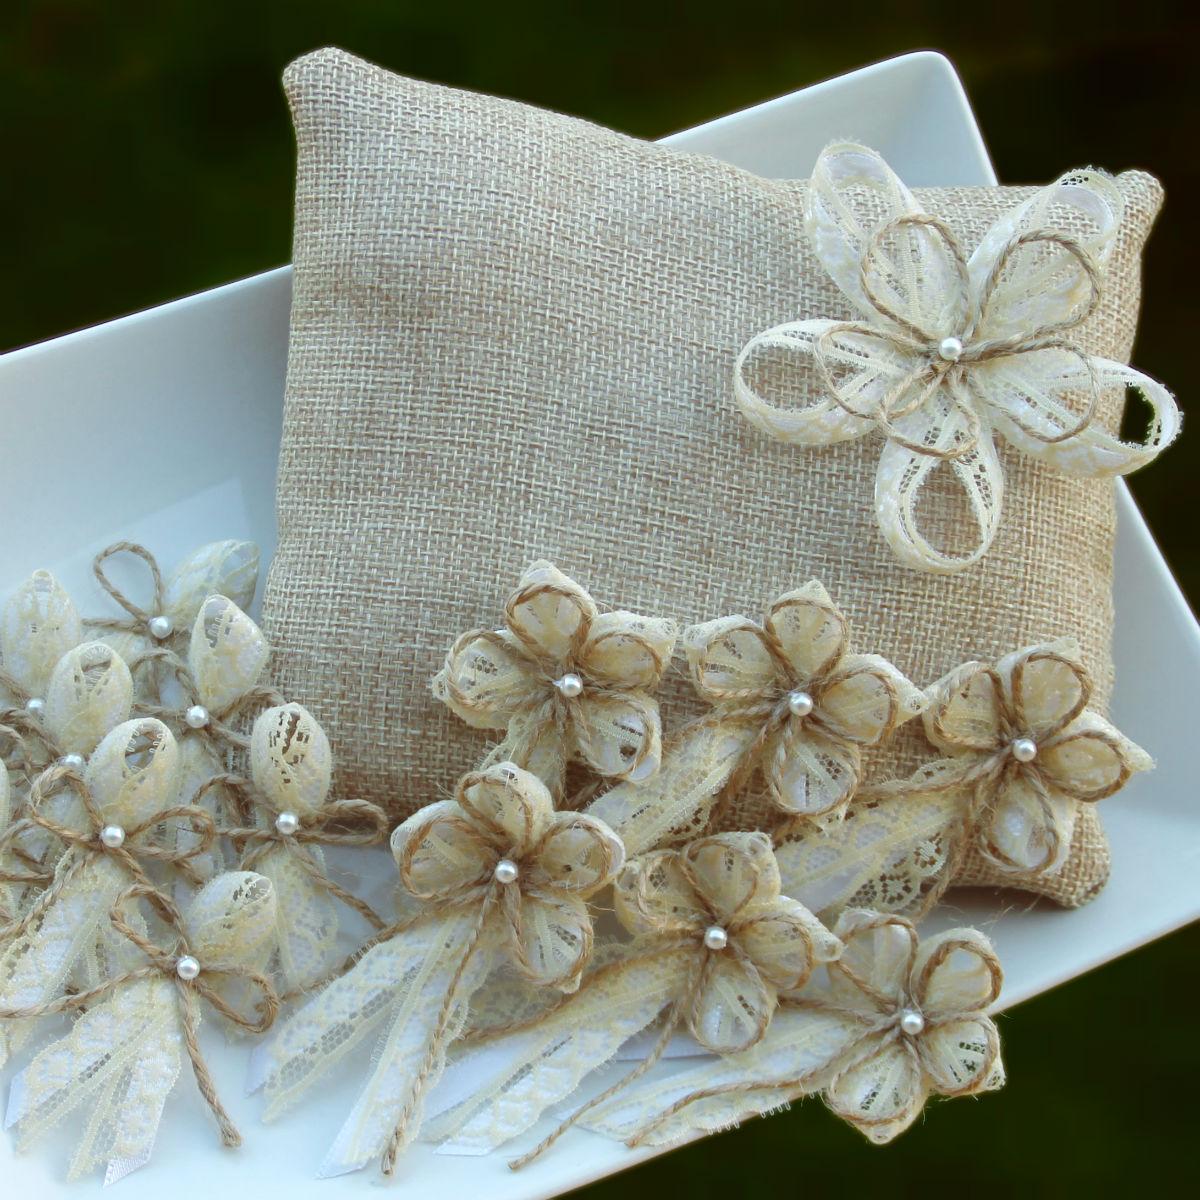 Svatba Prirodni Luxusni Polstarek Vyvazky Zakladni Sada 1 6 10